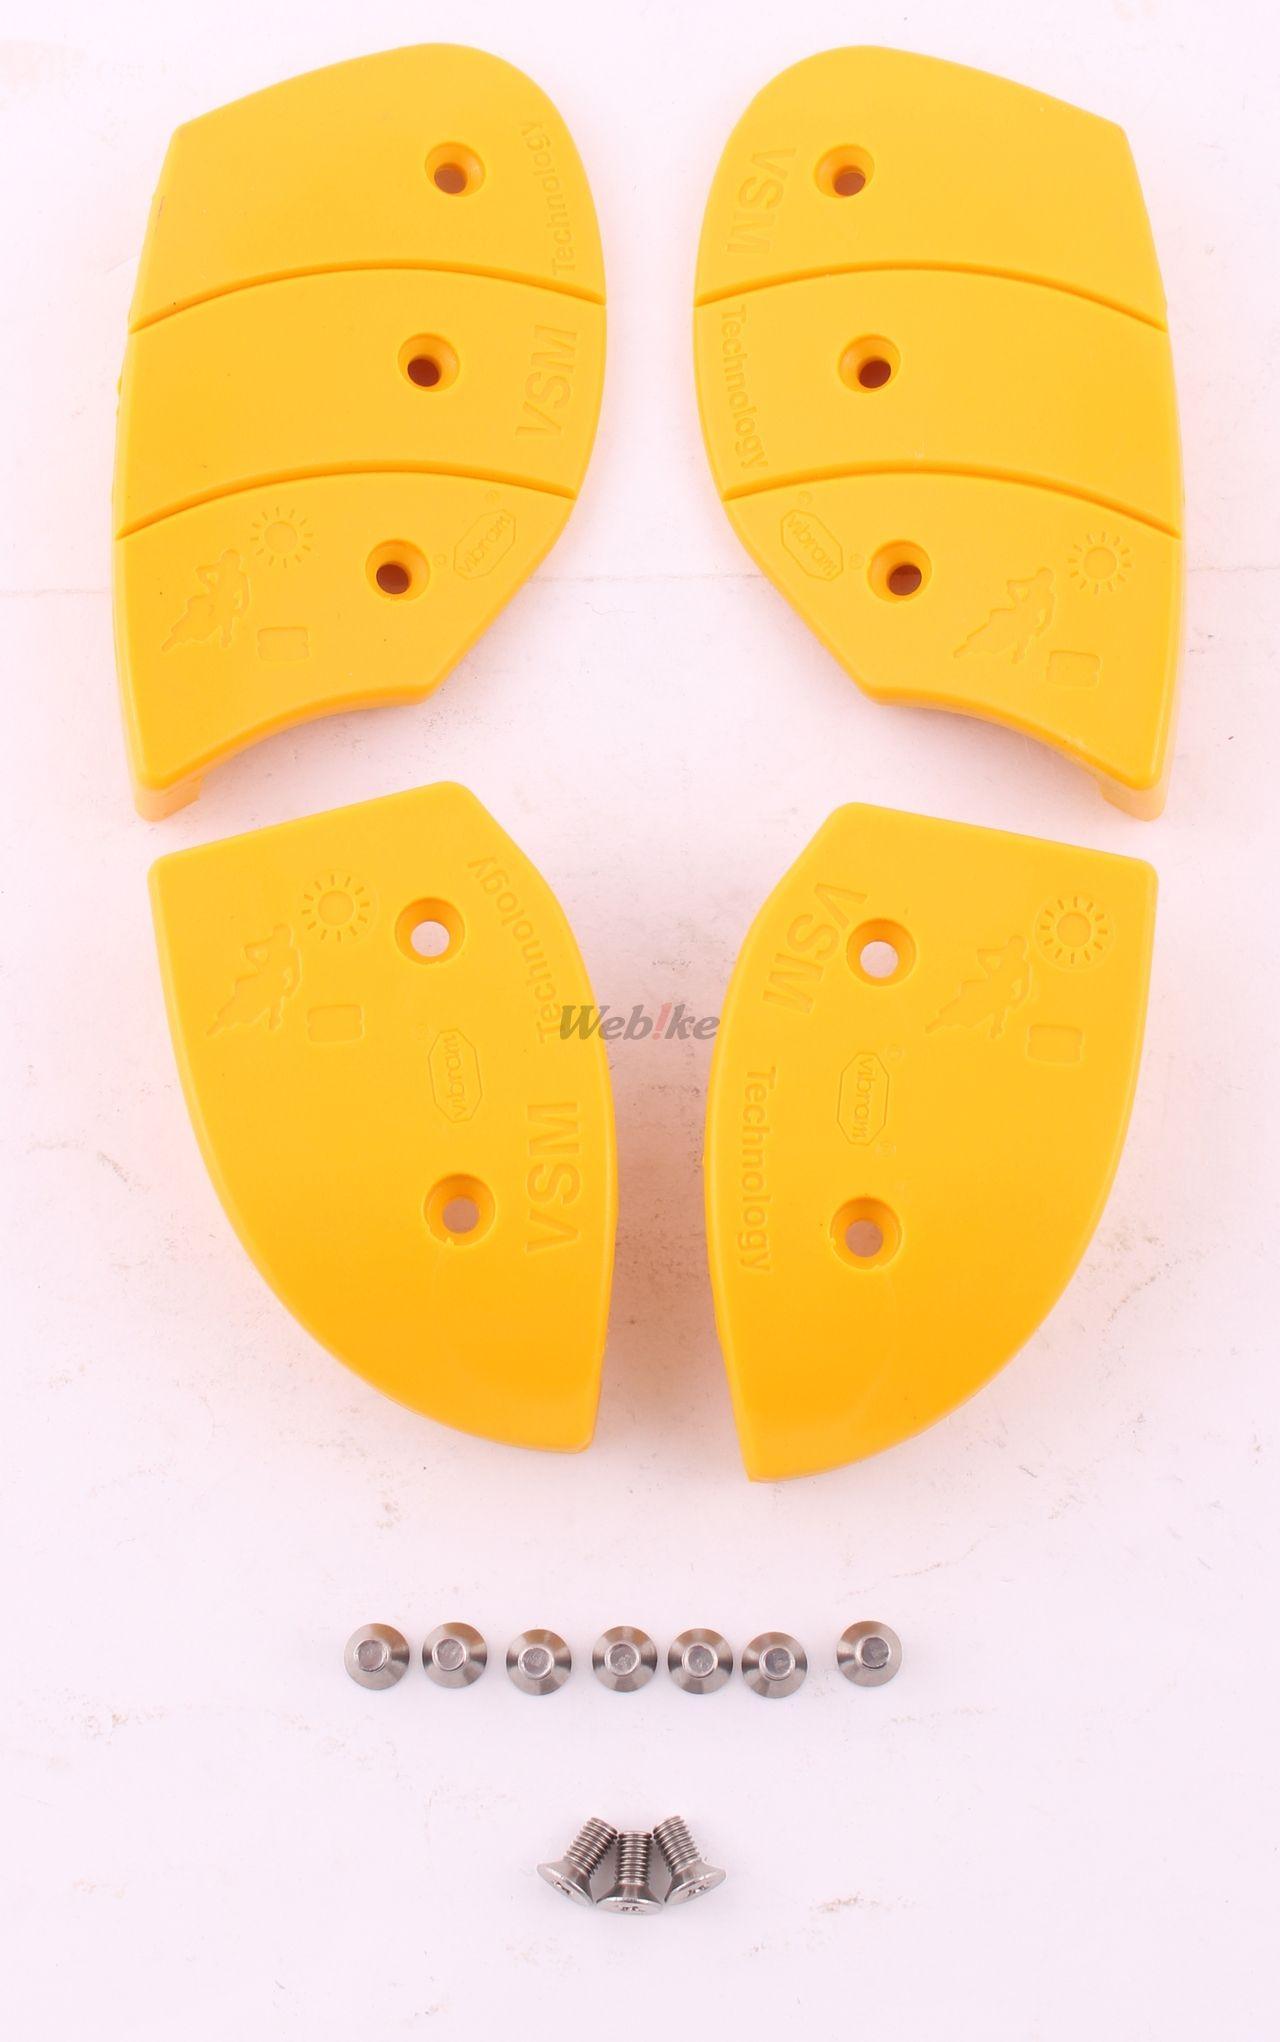 【gaerne】Vibram SUPER MOTARD SLIDER DRY(VSM鞋底防滑塊) - 「Webike-摩托百貨」